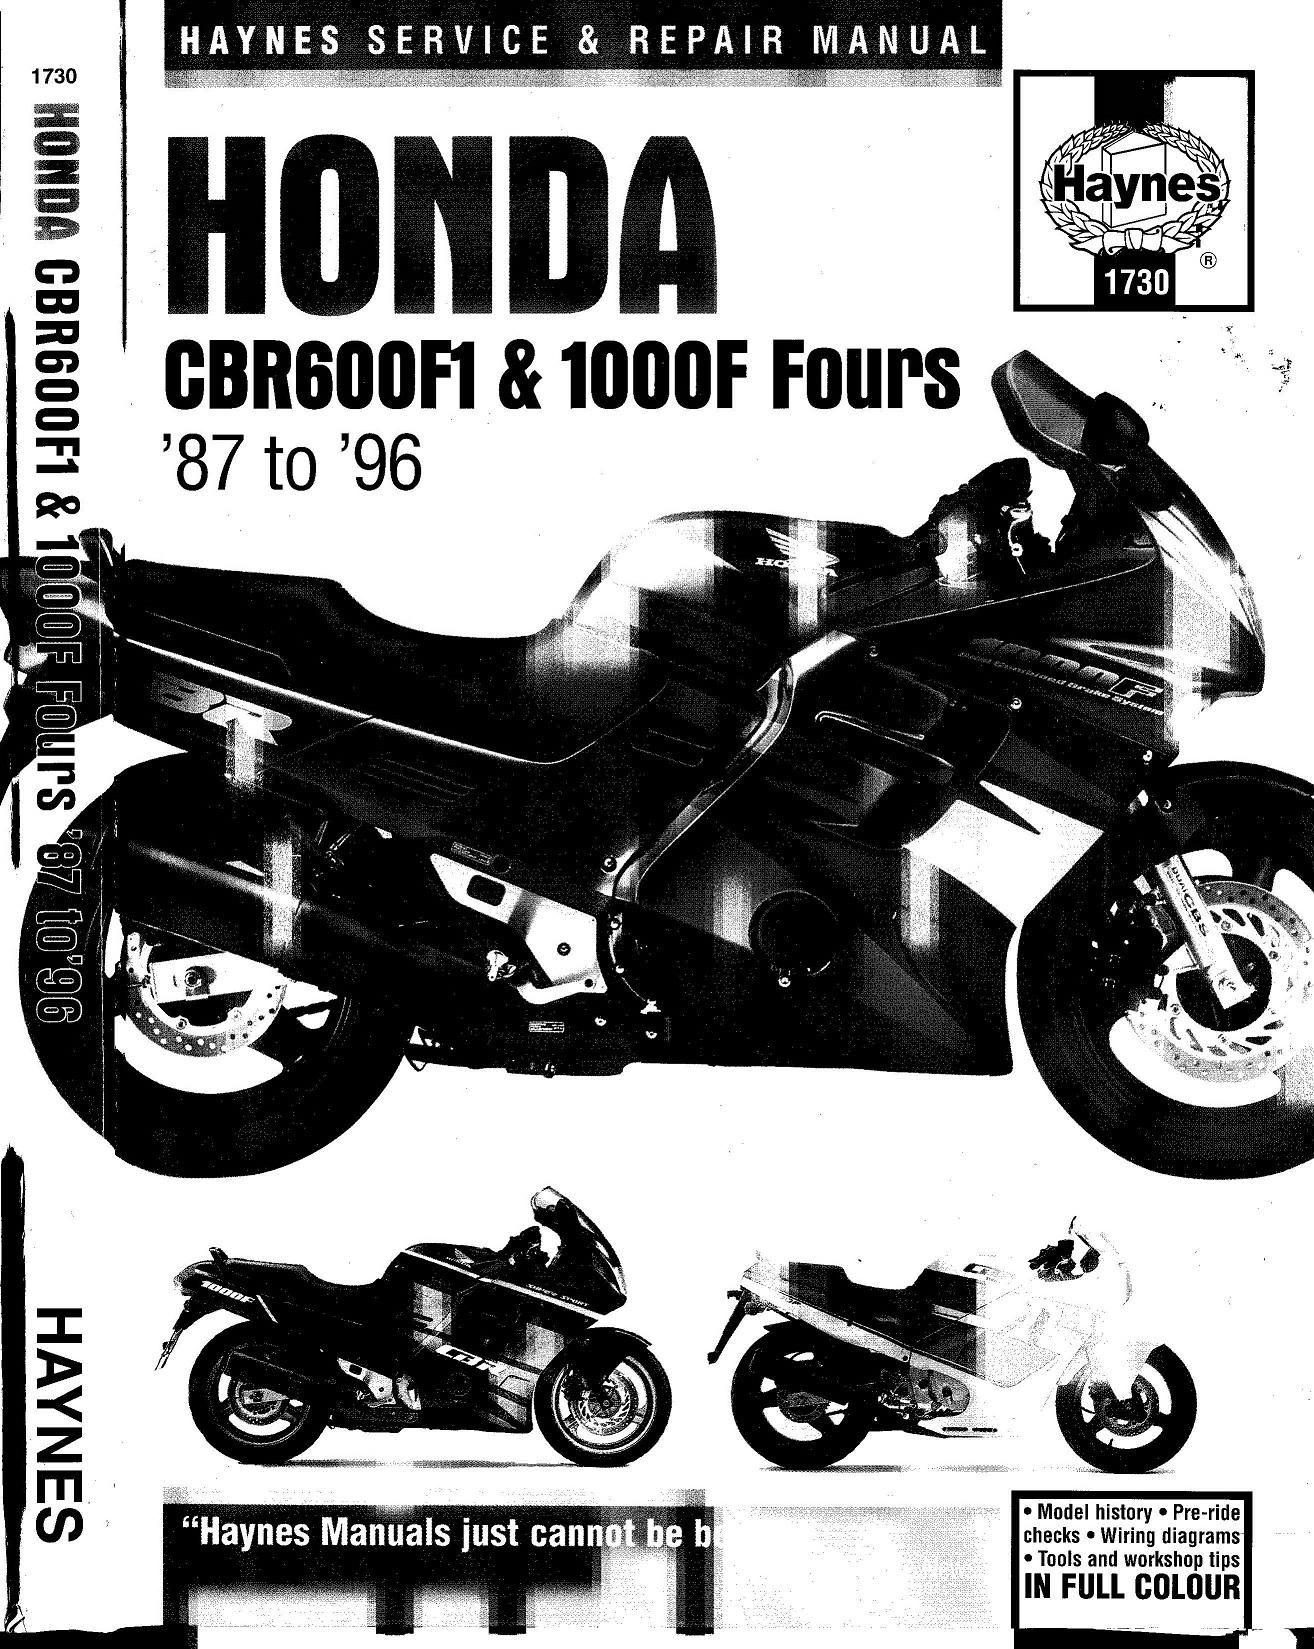 Workshop manual for Honda CBR600 F1 (1987-1996)